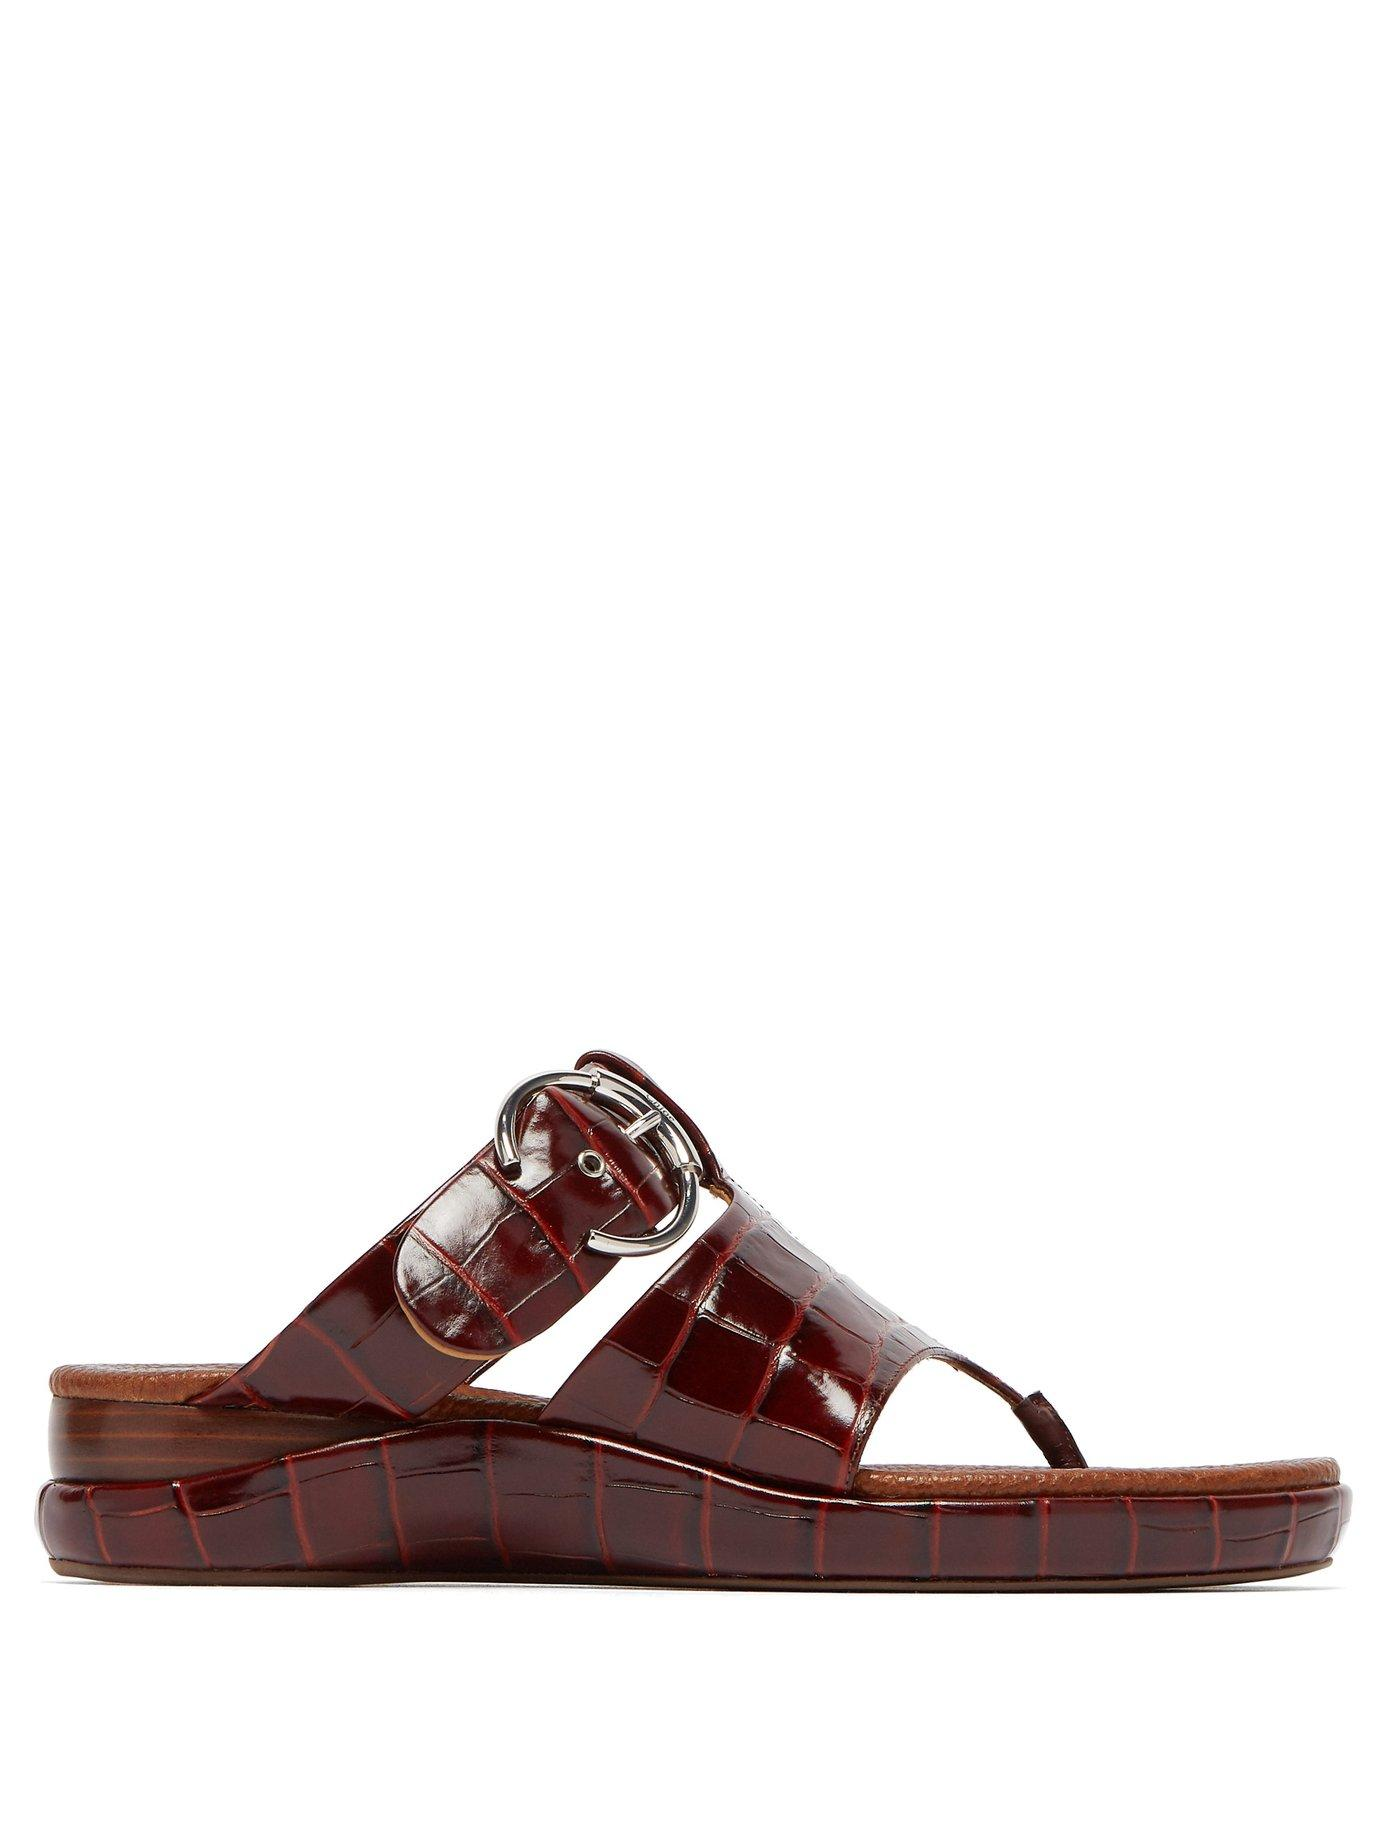 9568206b2 Lyst - Chloé Crocodile Embossed Asymmetric Leather Sandals in Brown